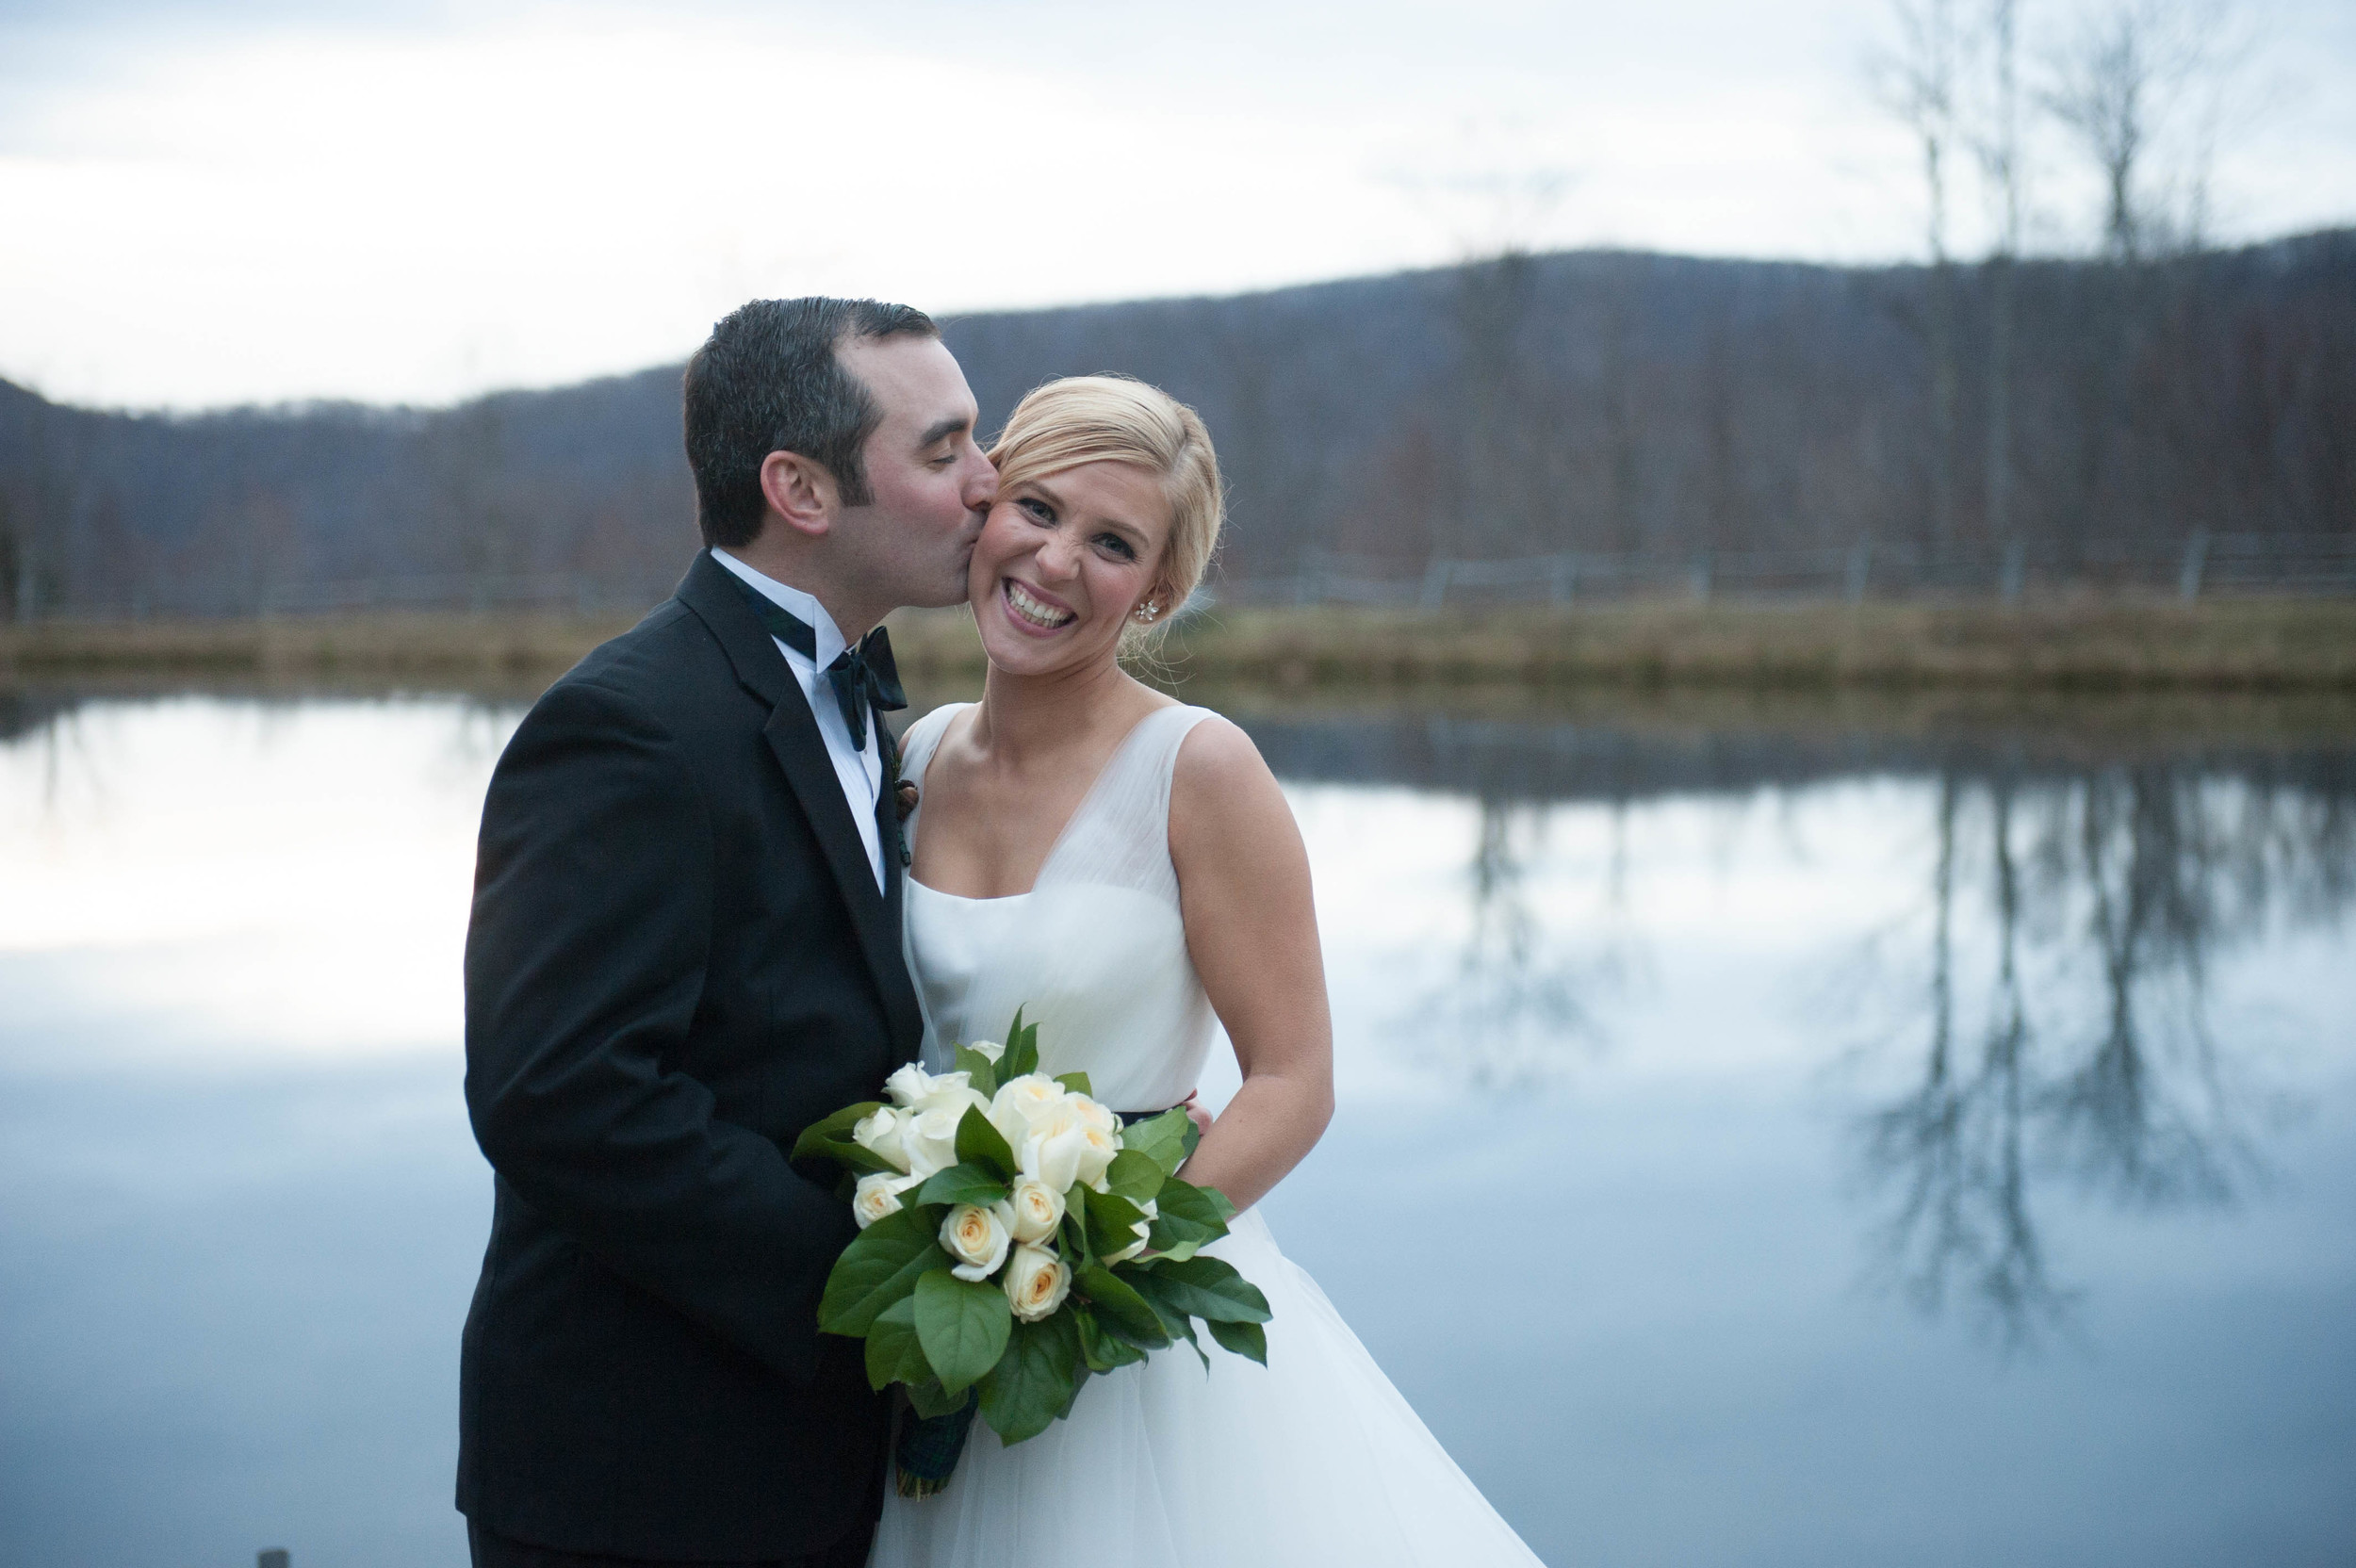 The_Ponds_Vermont_Wedding_Photo-69.jpg